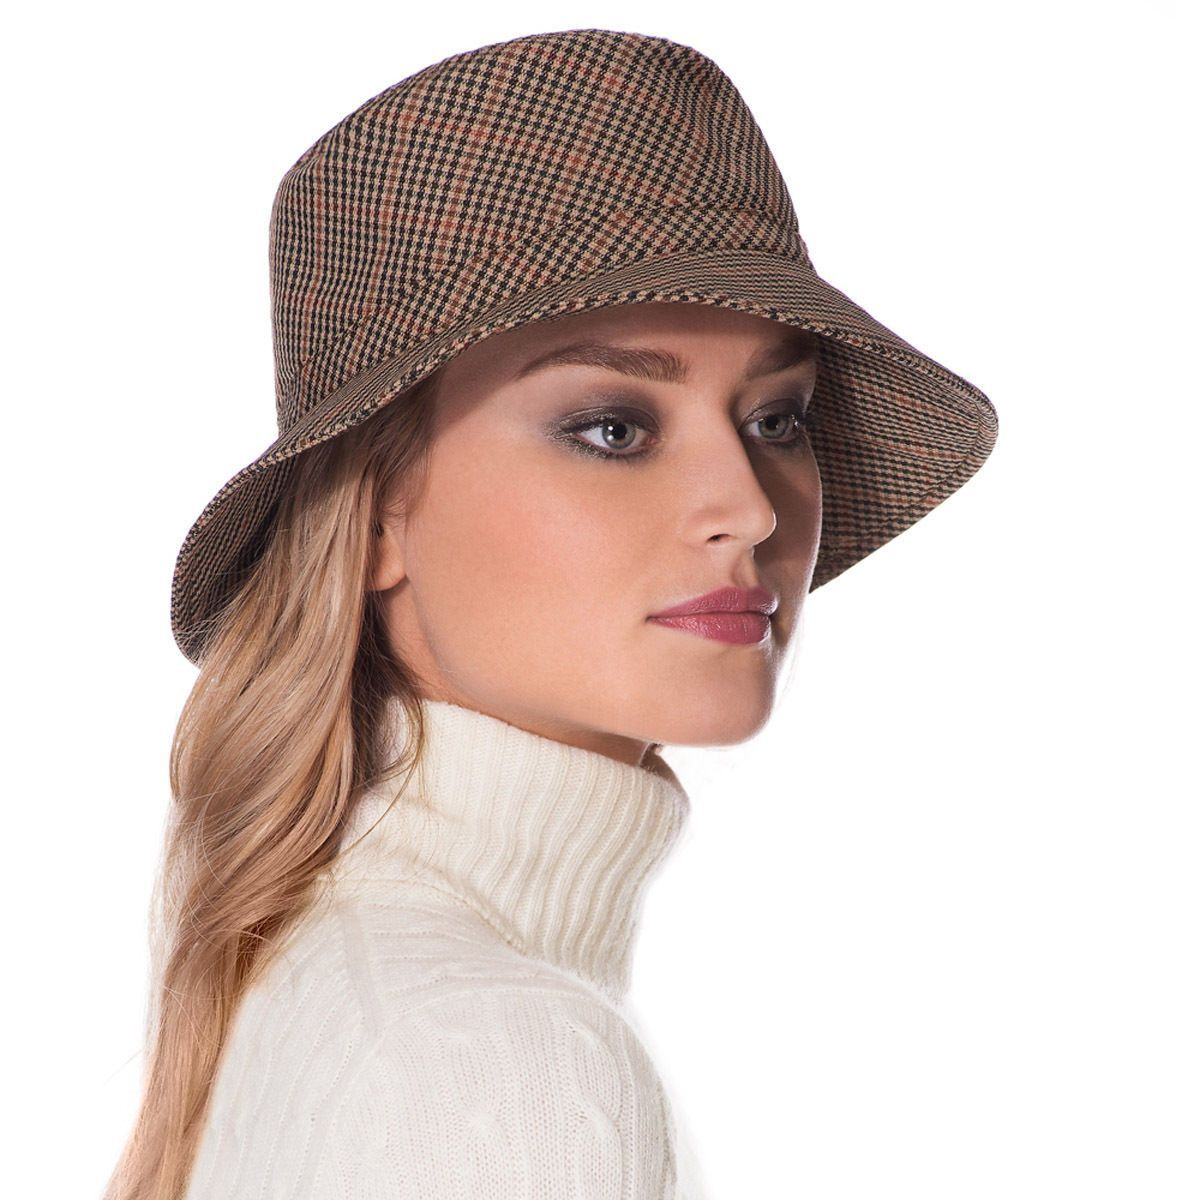 Eric Javits Fashion Designer Women S Headwear Hat - Rain Bucket - Tan Check 1d234a87c365